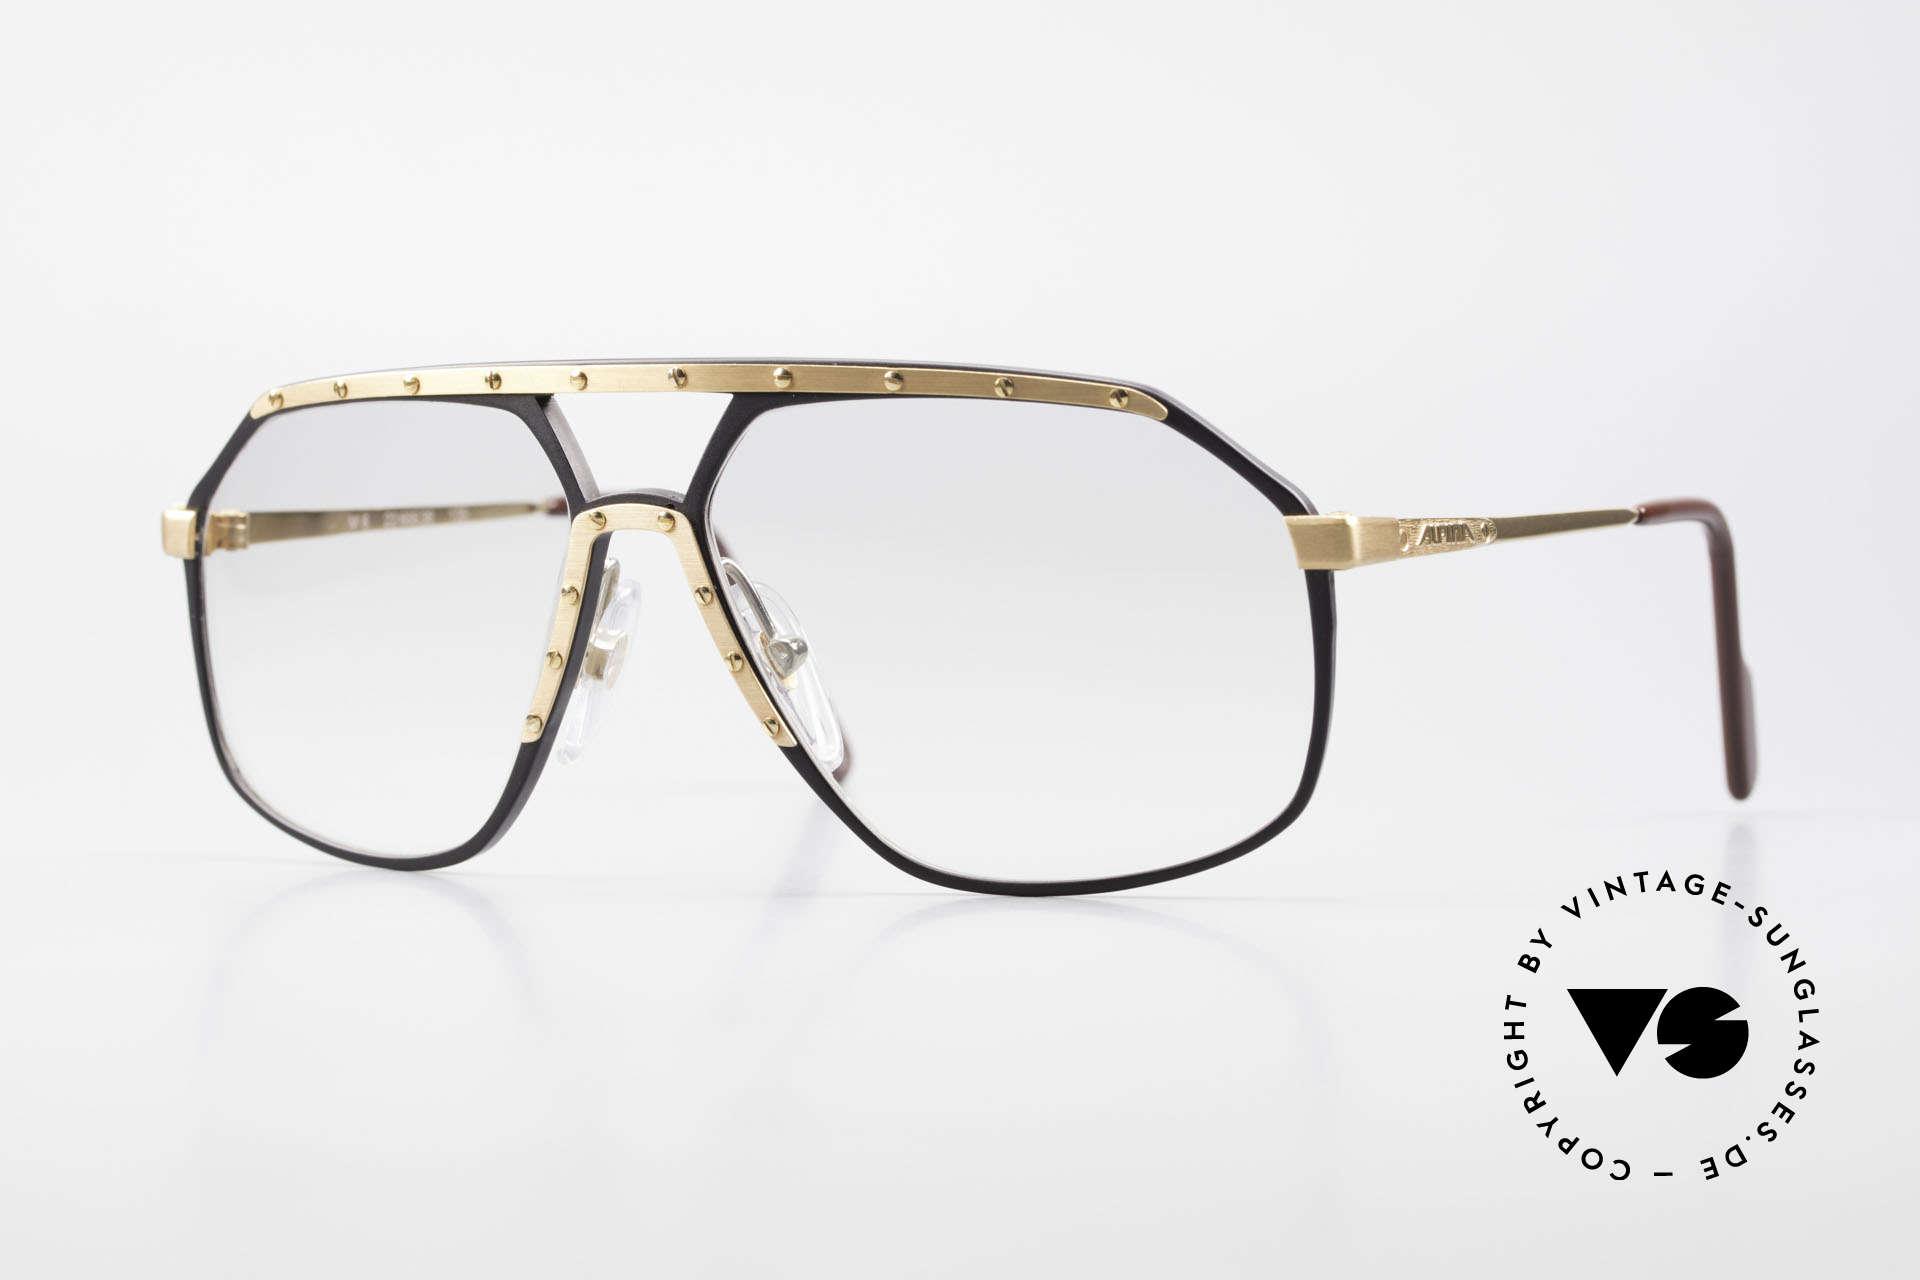 Alpina M6 80's Glasses Light Tinted Lens, legendary Alpina M6 vintage designer sunglasses, Made for Men